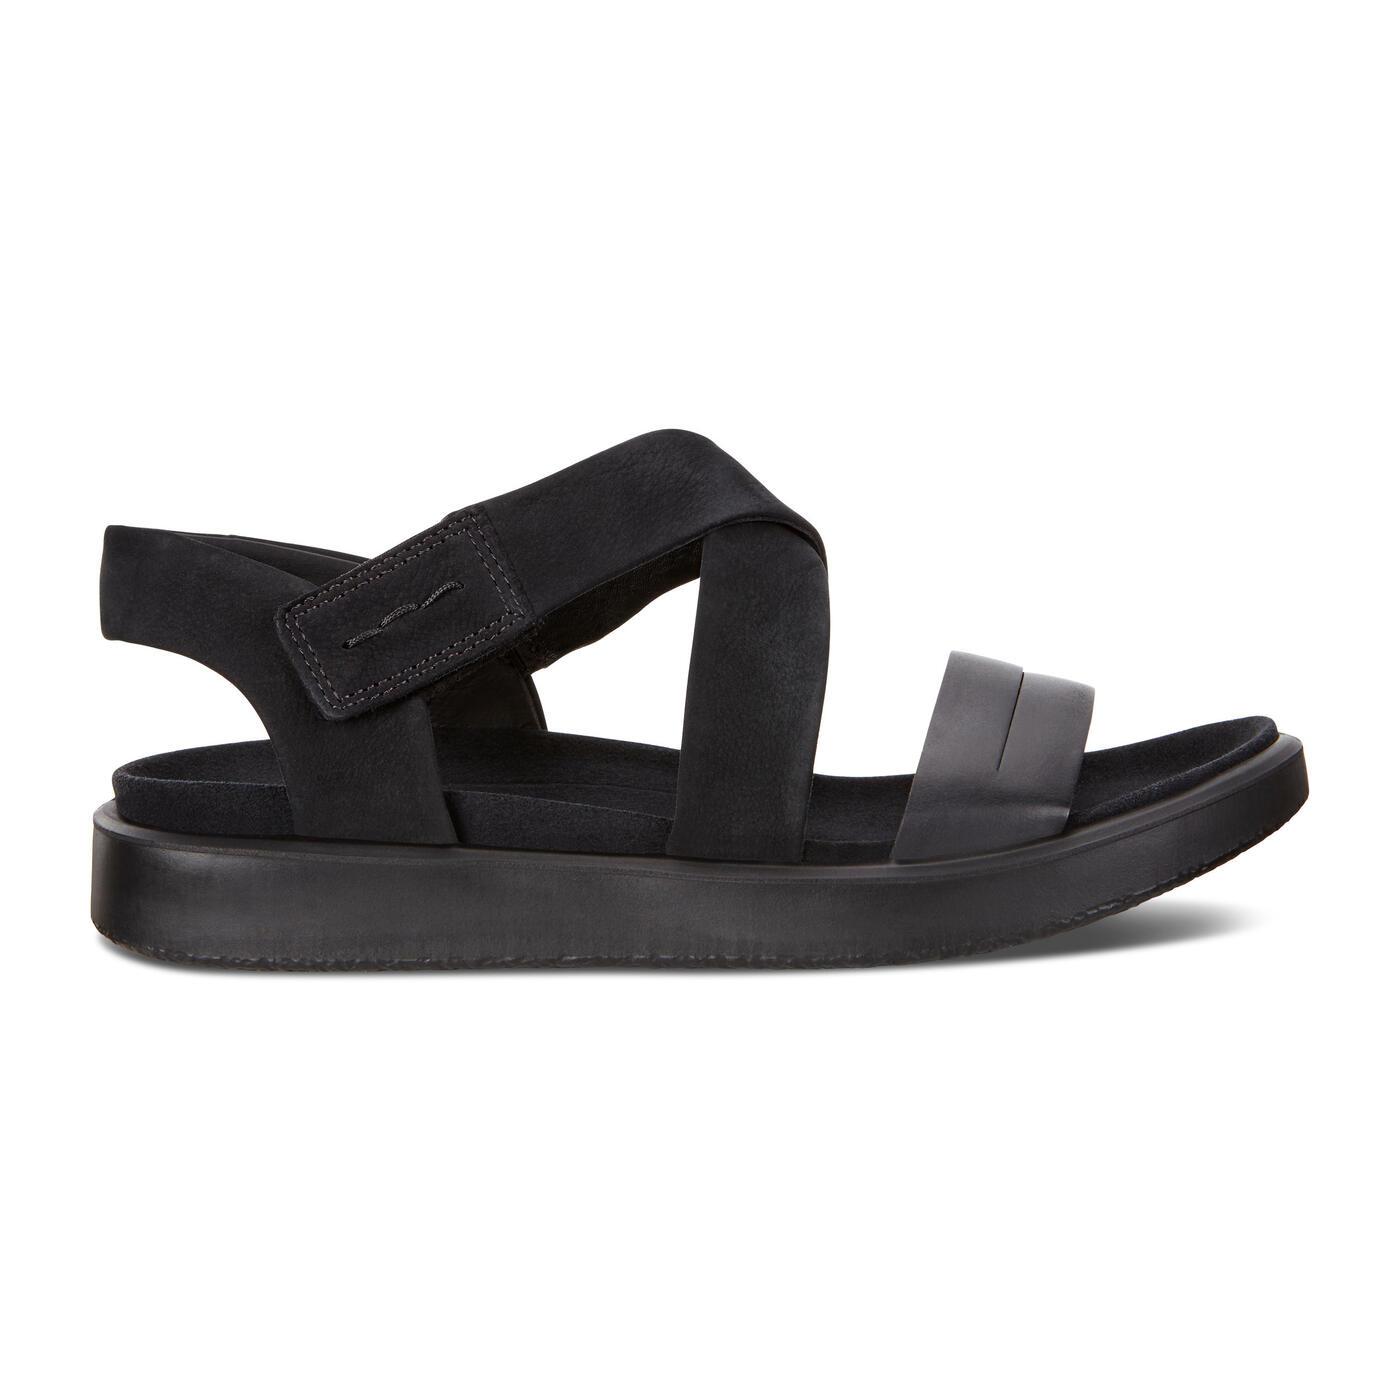 ECCO Flowt Women's Sandal